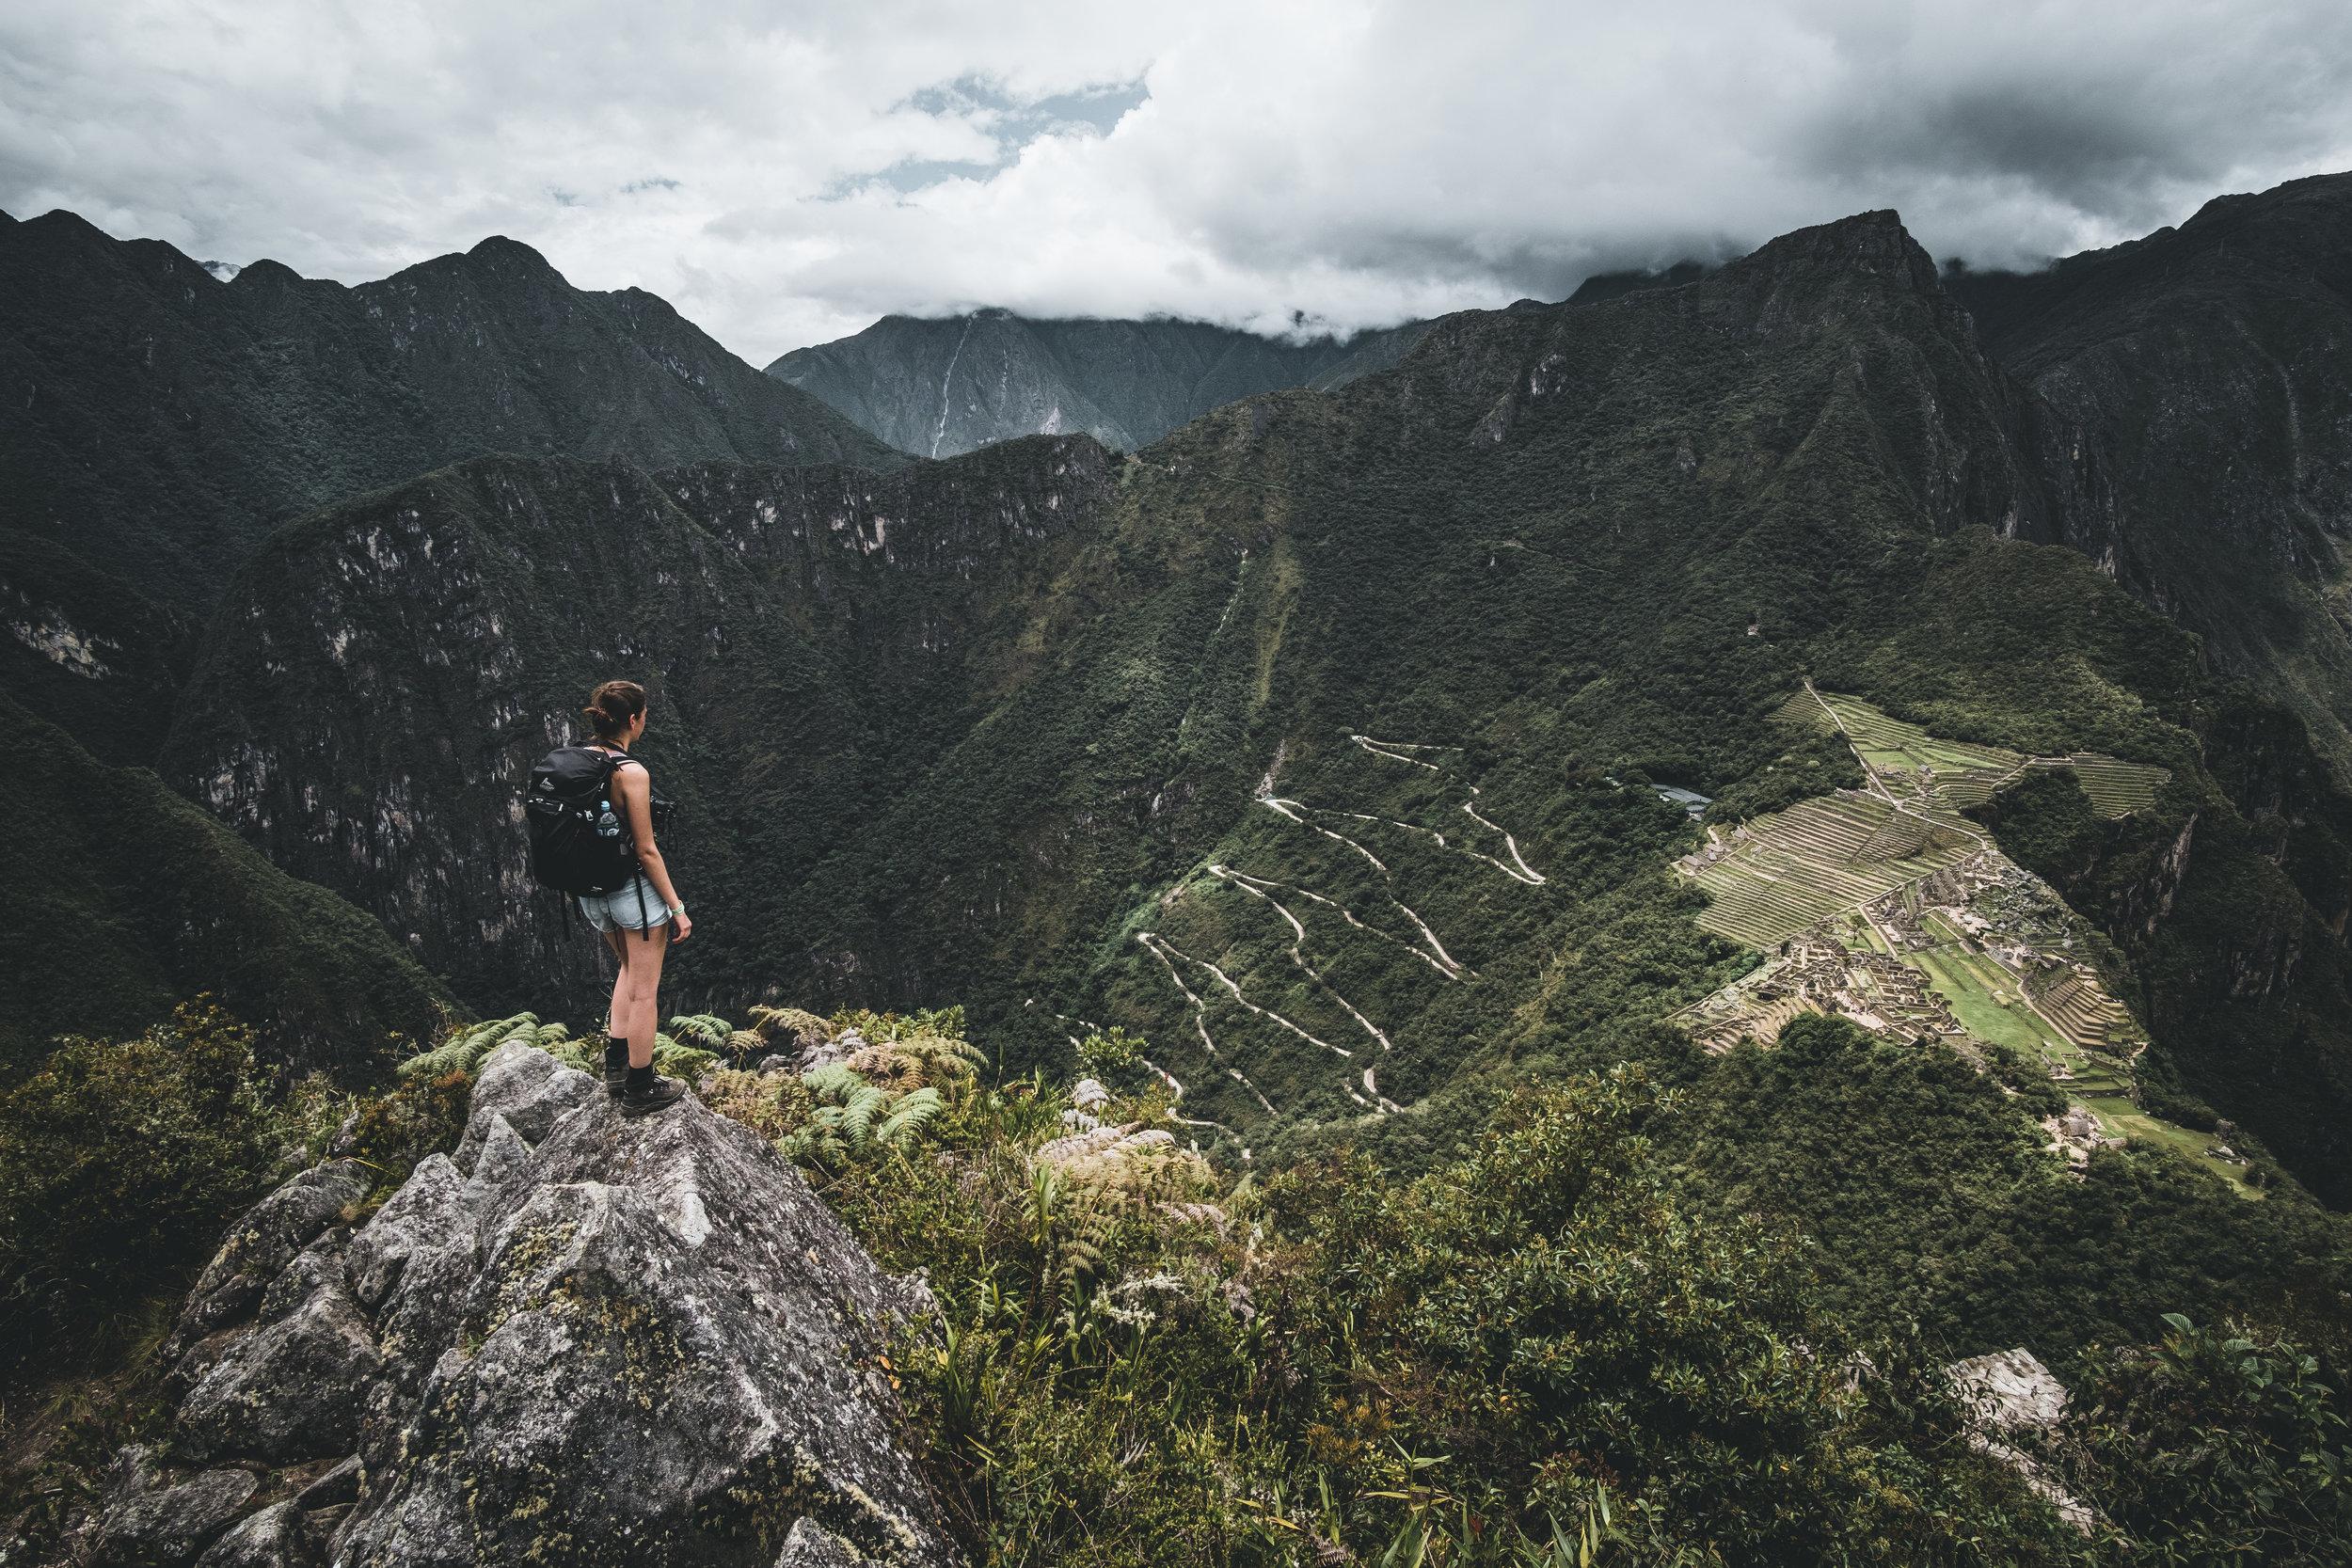 On top of the mountain Huayna Picchu | Urubamba valley